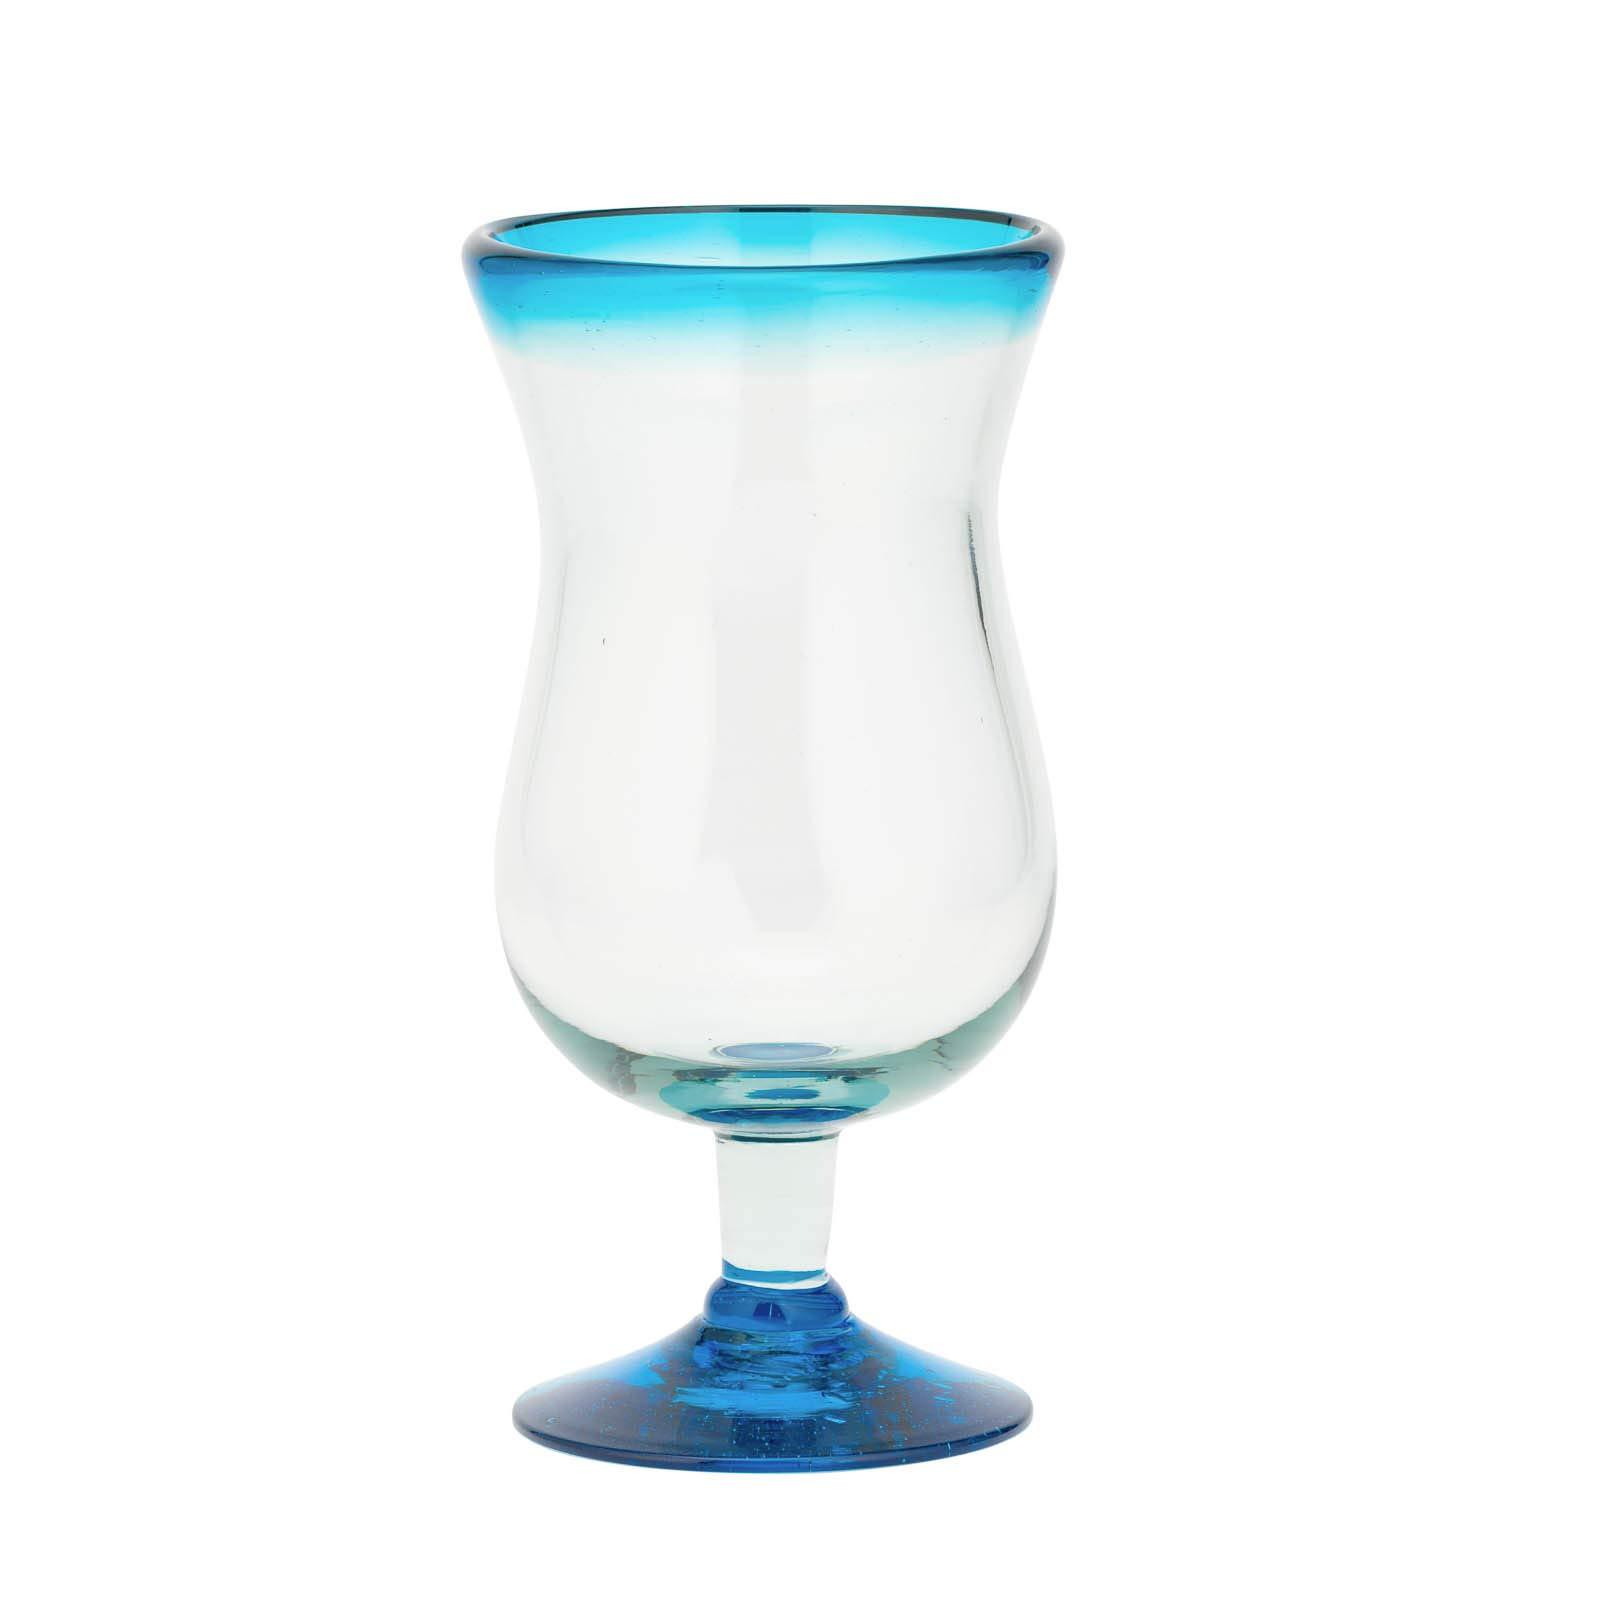 Amici Home 7MCR379S4R Baja Hurricane Drinking Glass 16 Fluid Ounces Aqua Rim